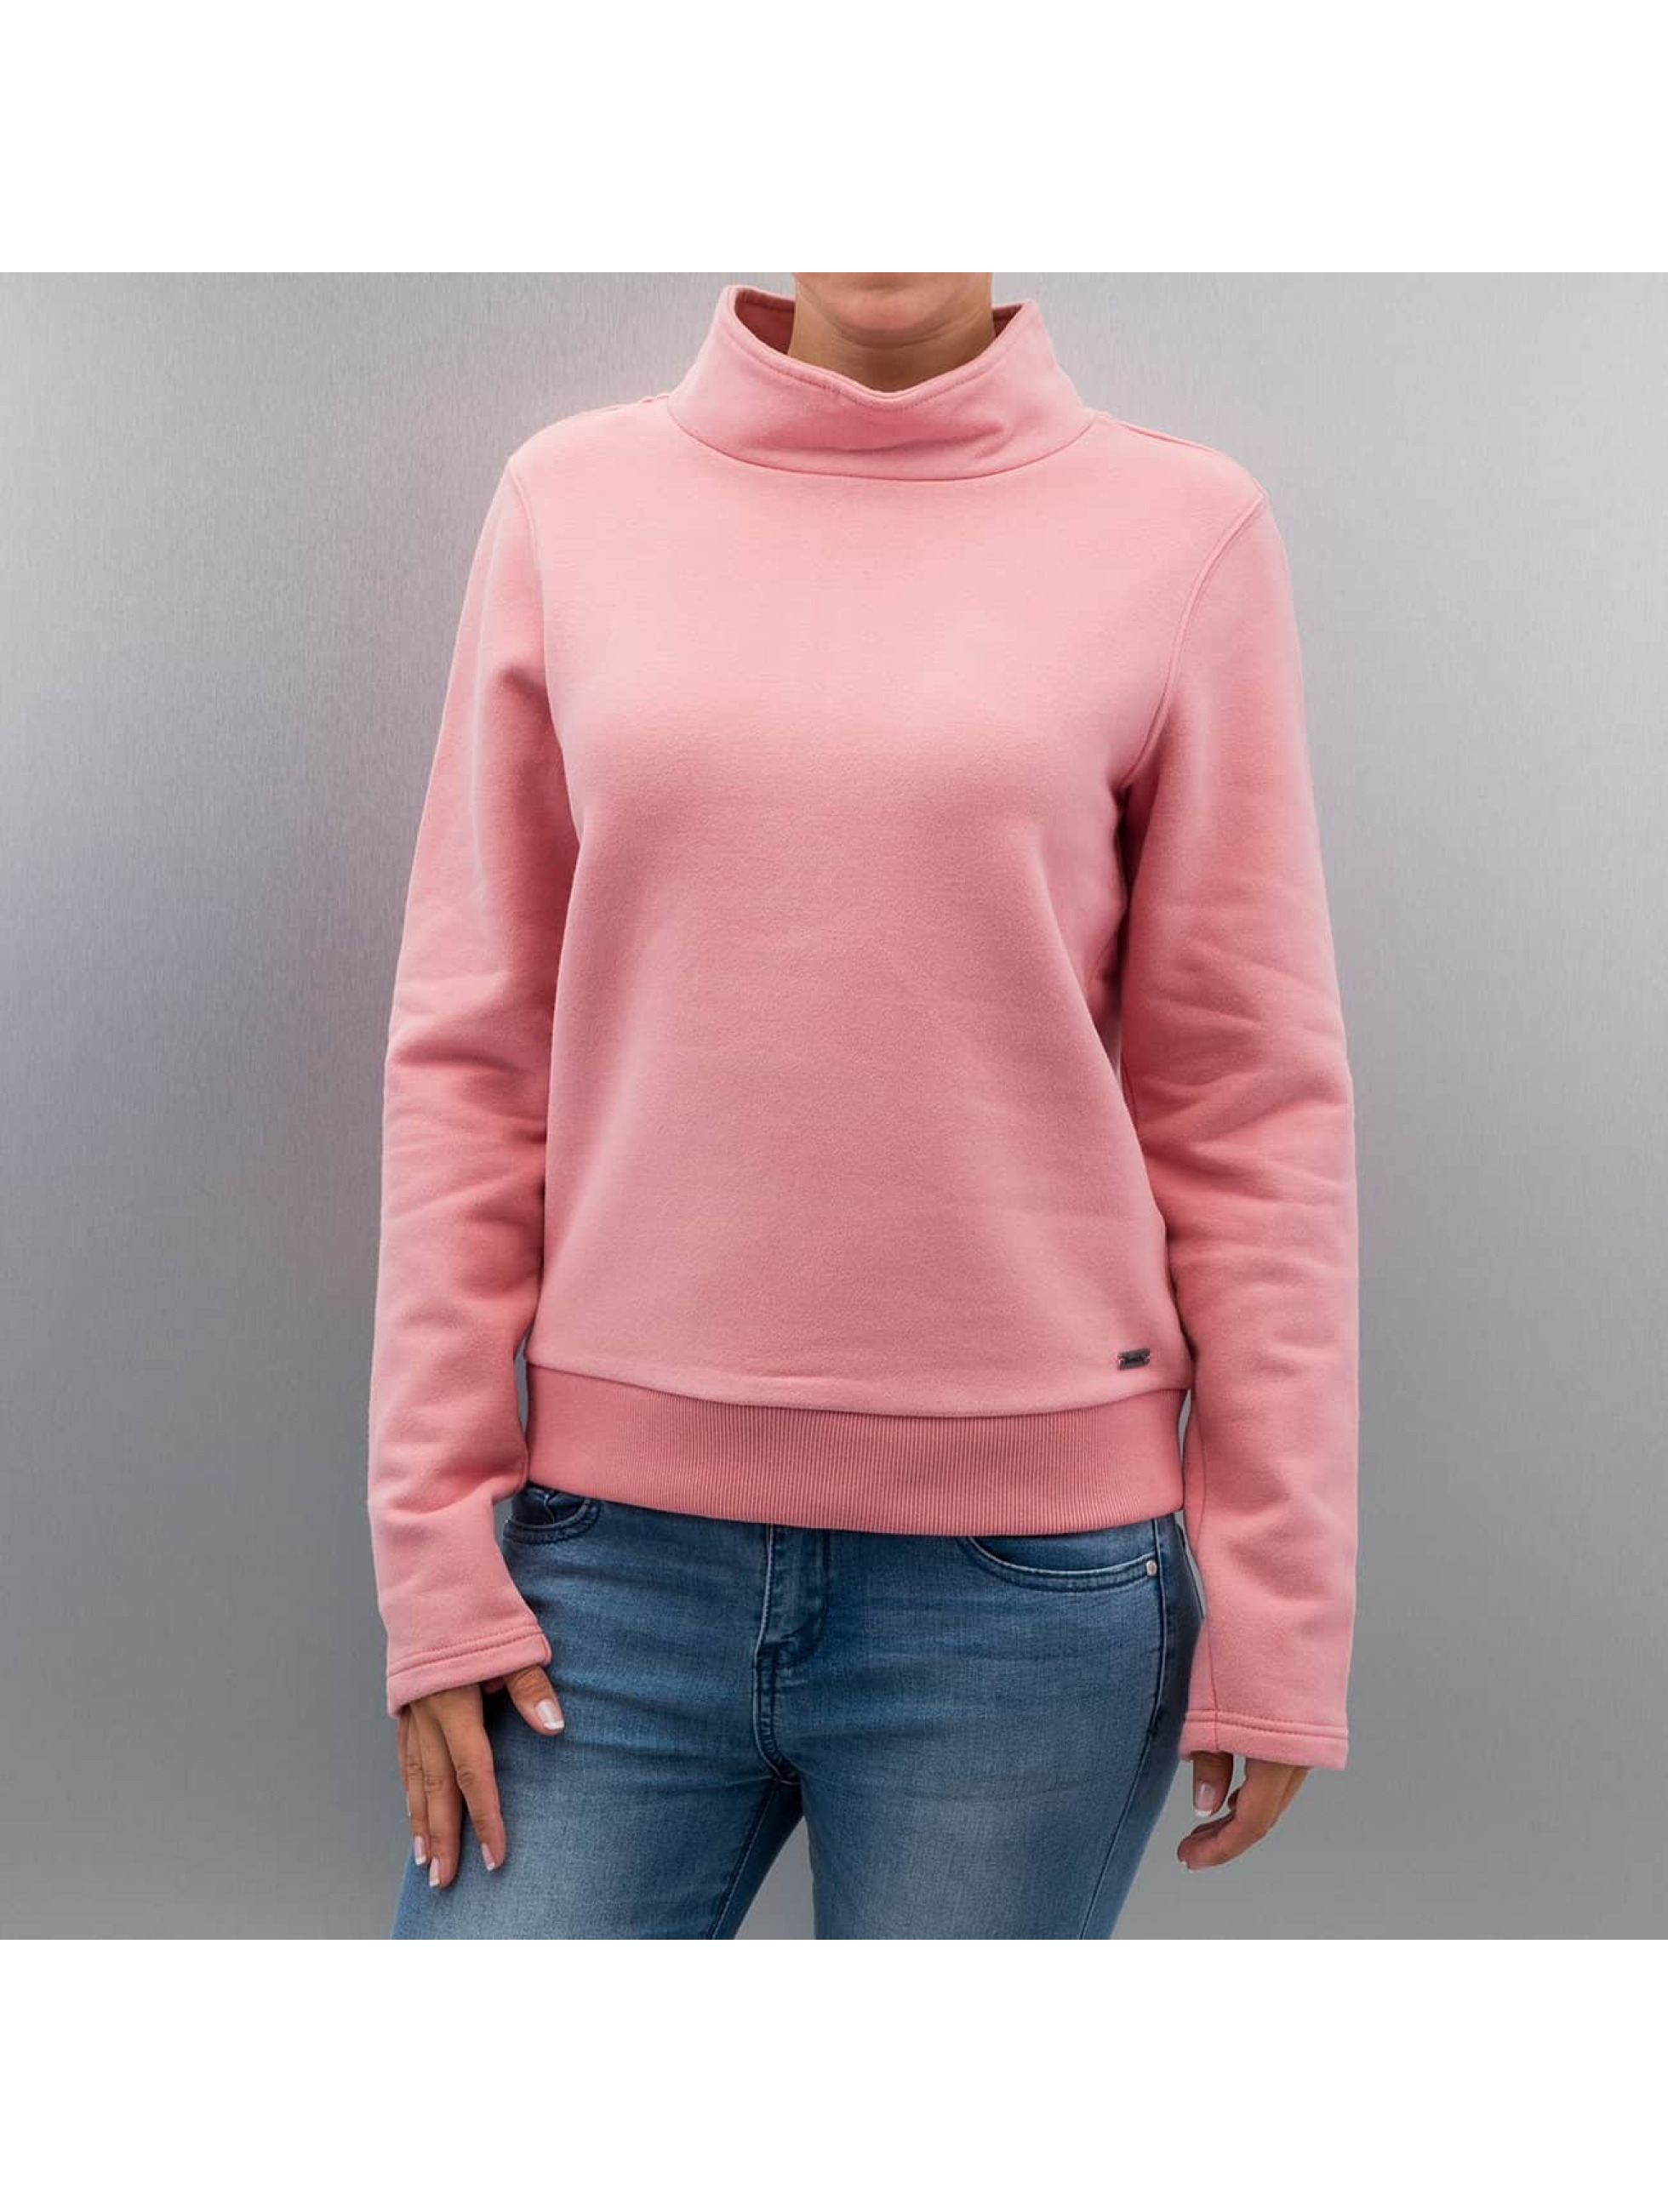 Pullover Repay in rosa